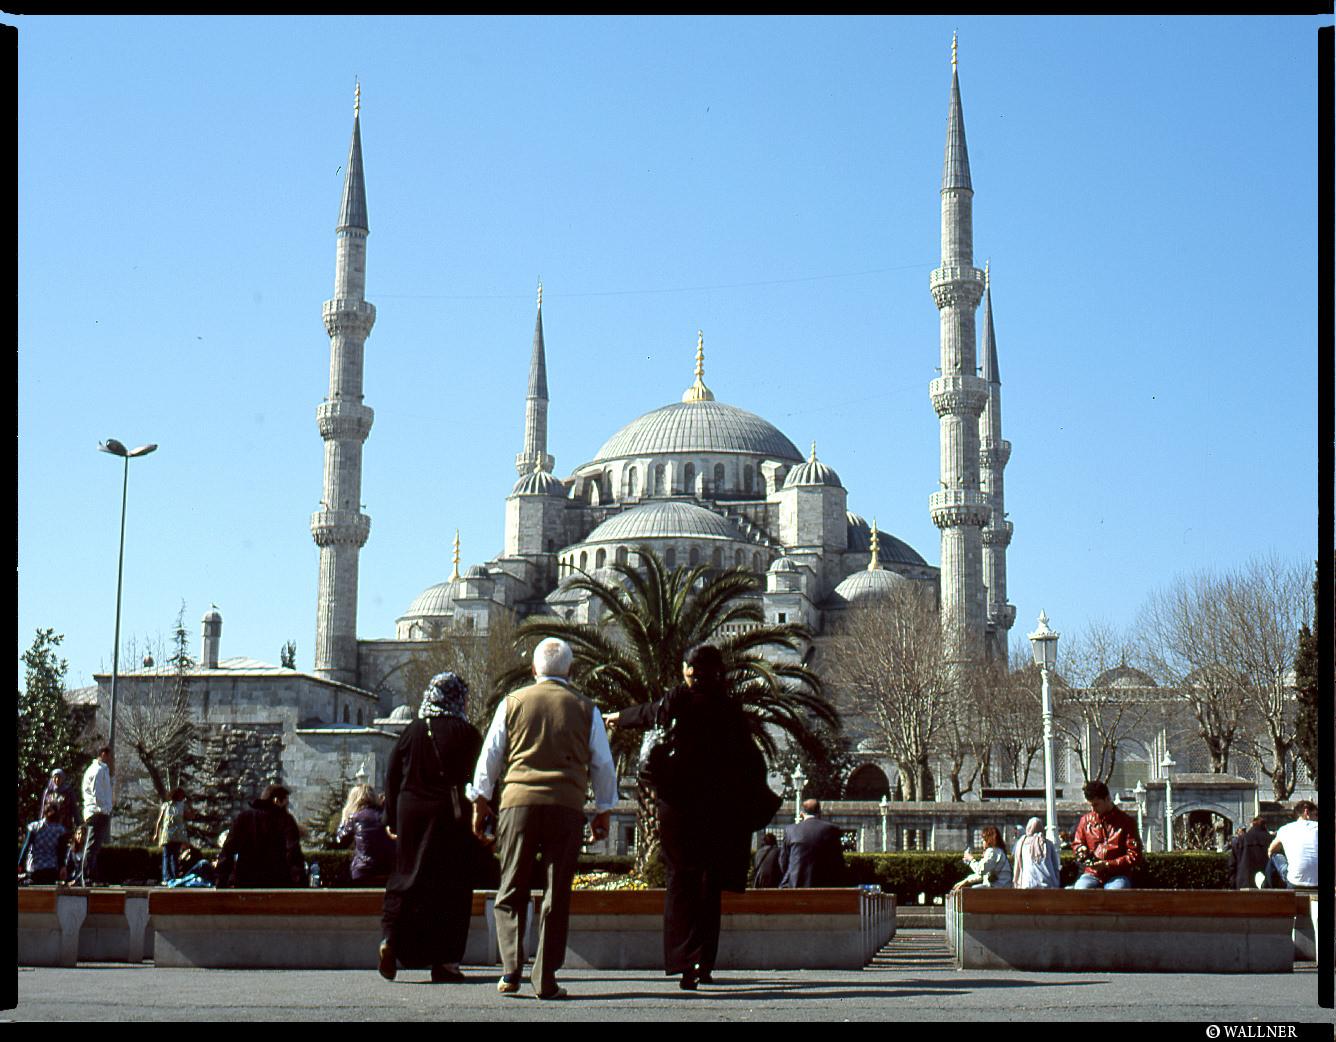 MediumFormatPatrikWallner_Istanbul_BlueMosqueAndSky_LOWQ